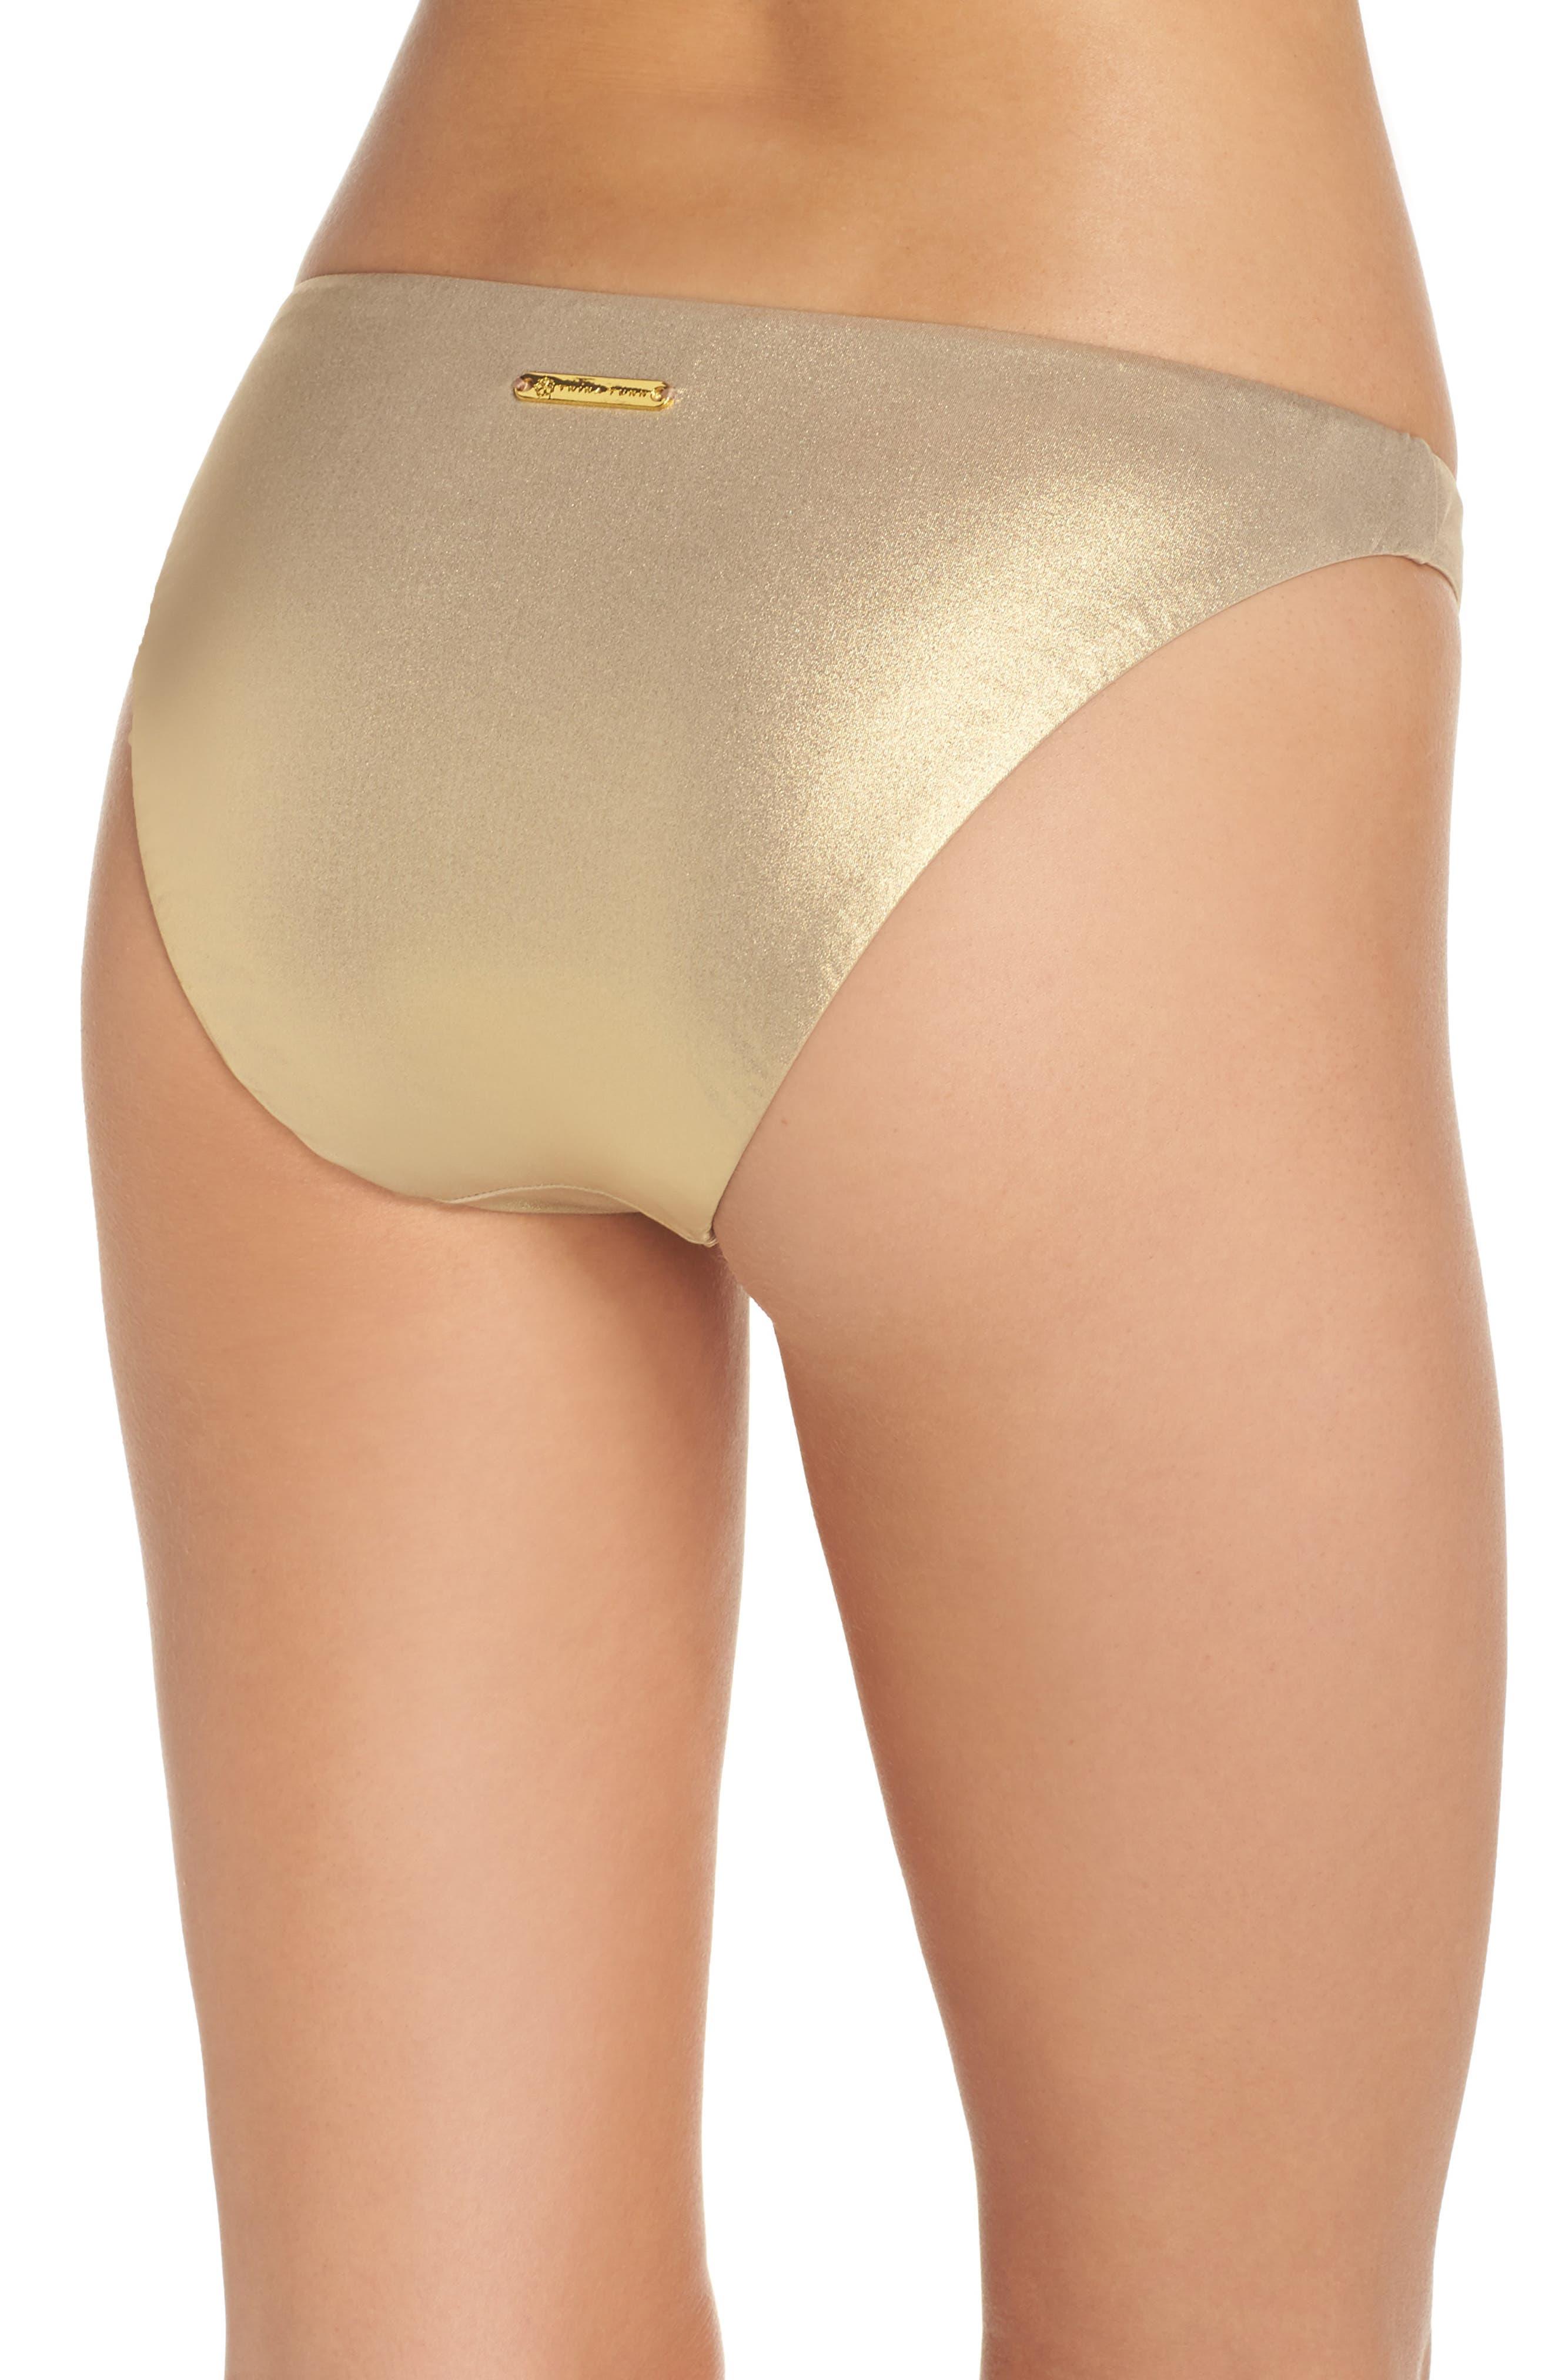 Alternate Image 2  - Trina Turk Golden Medallion Bikini Bottoms